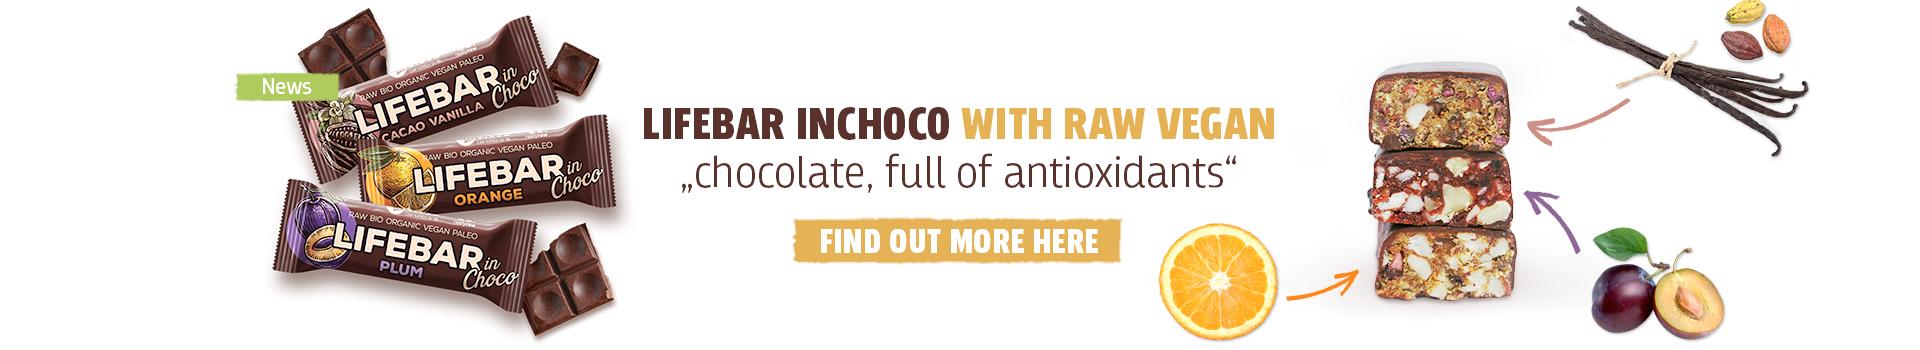 New inChoco bars